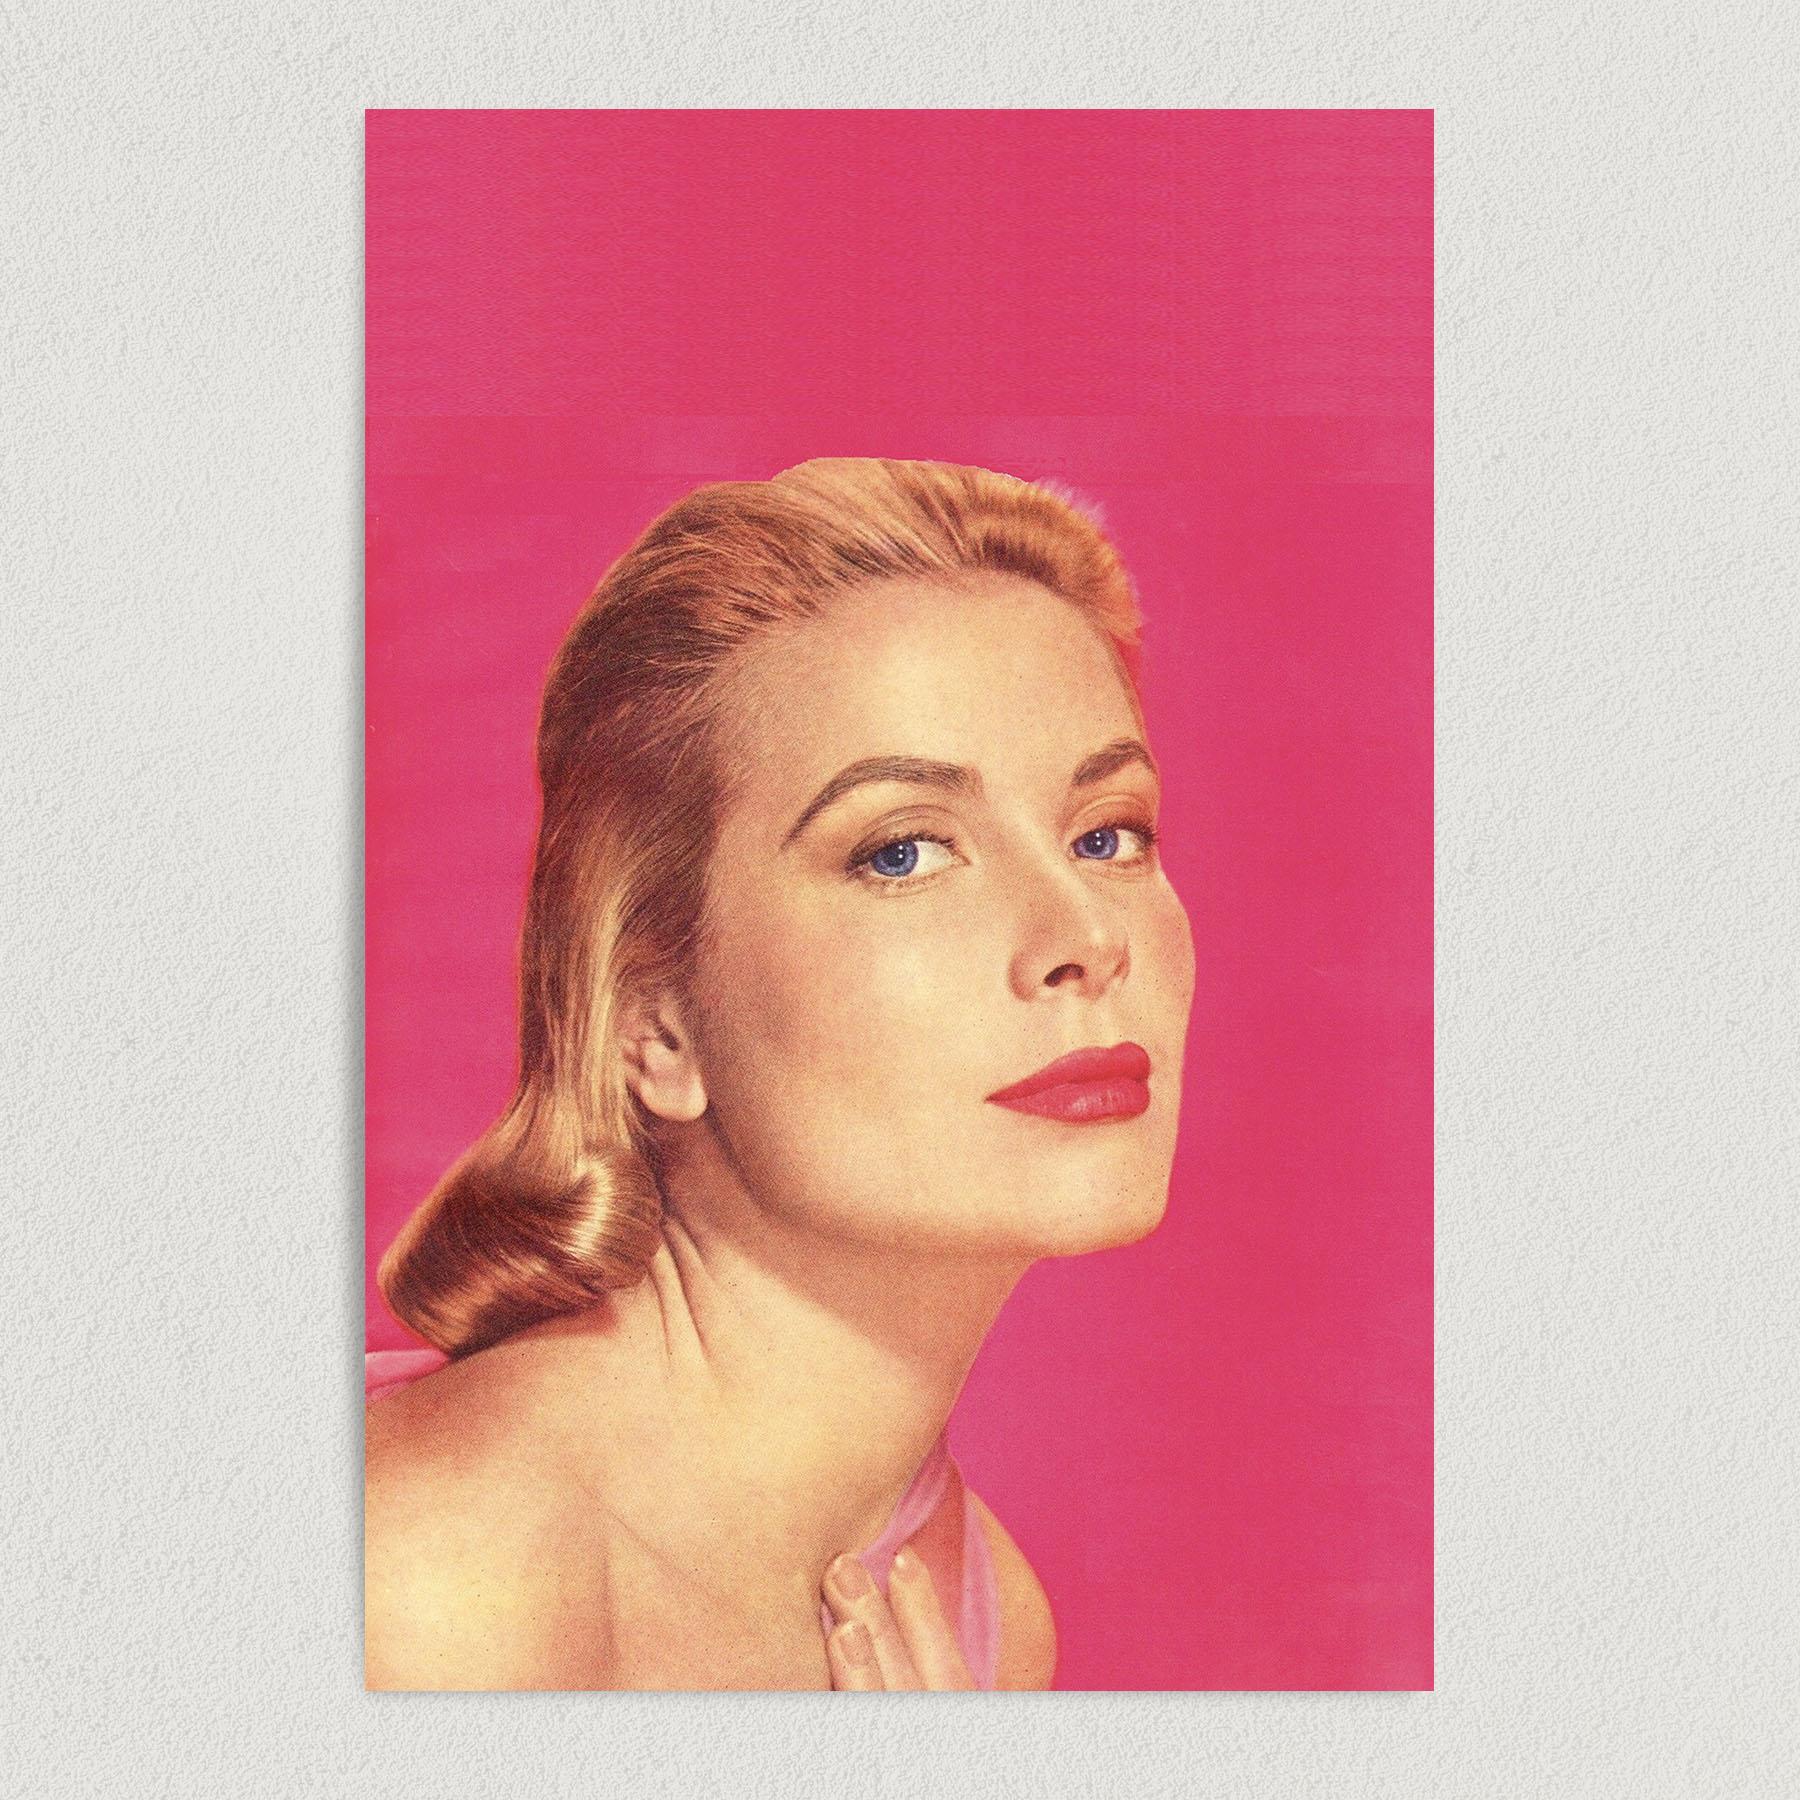 Grace Kelly Portrait Art Print Poster 12″ x 18″ Wall Art HW1000